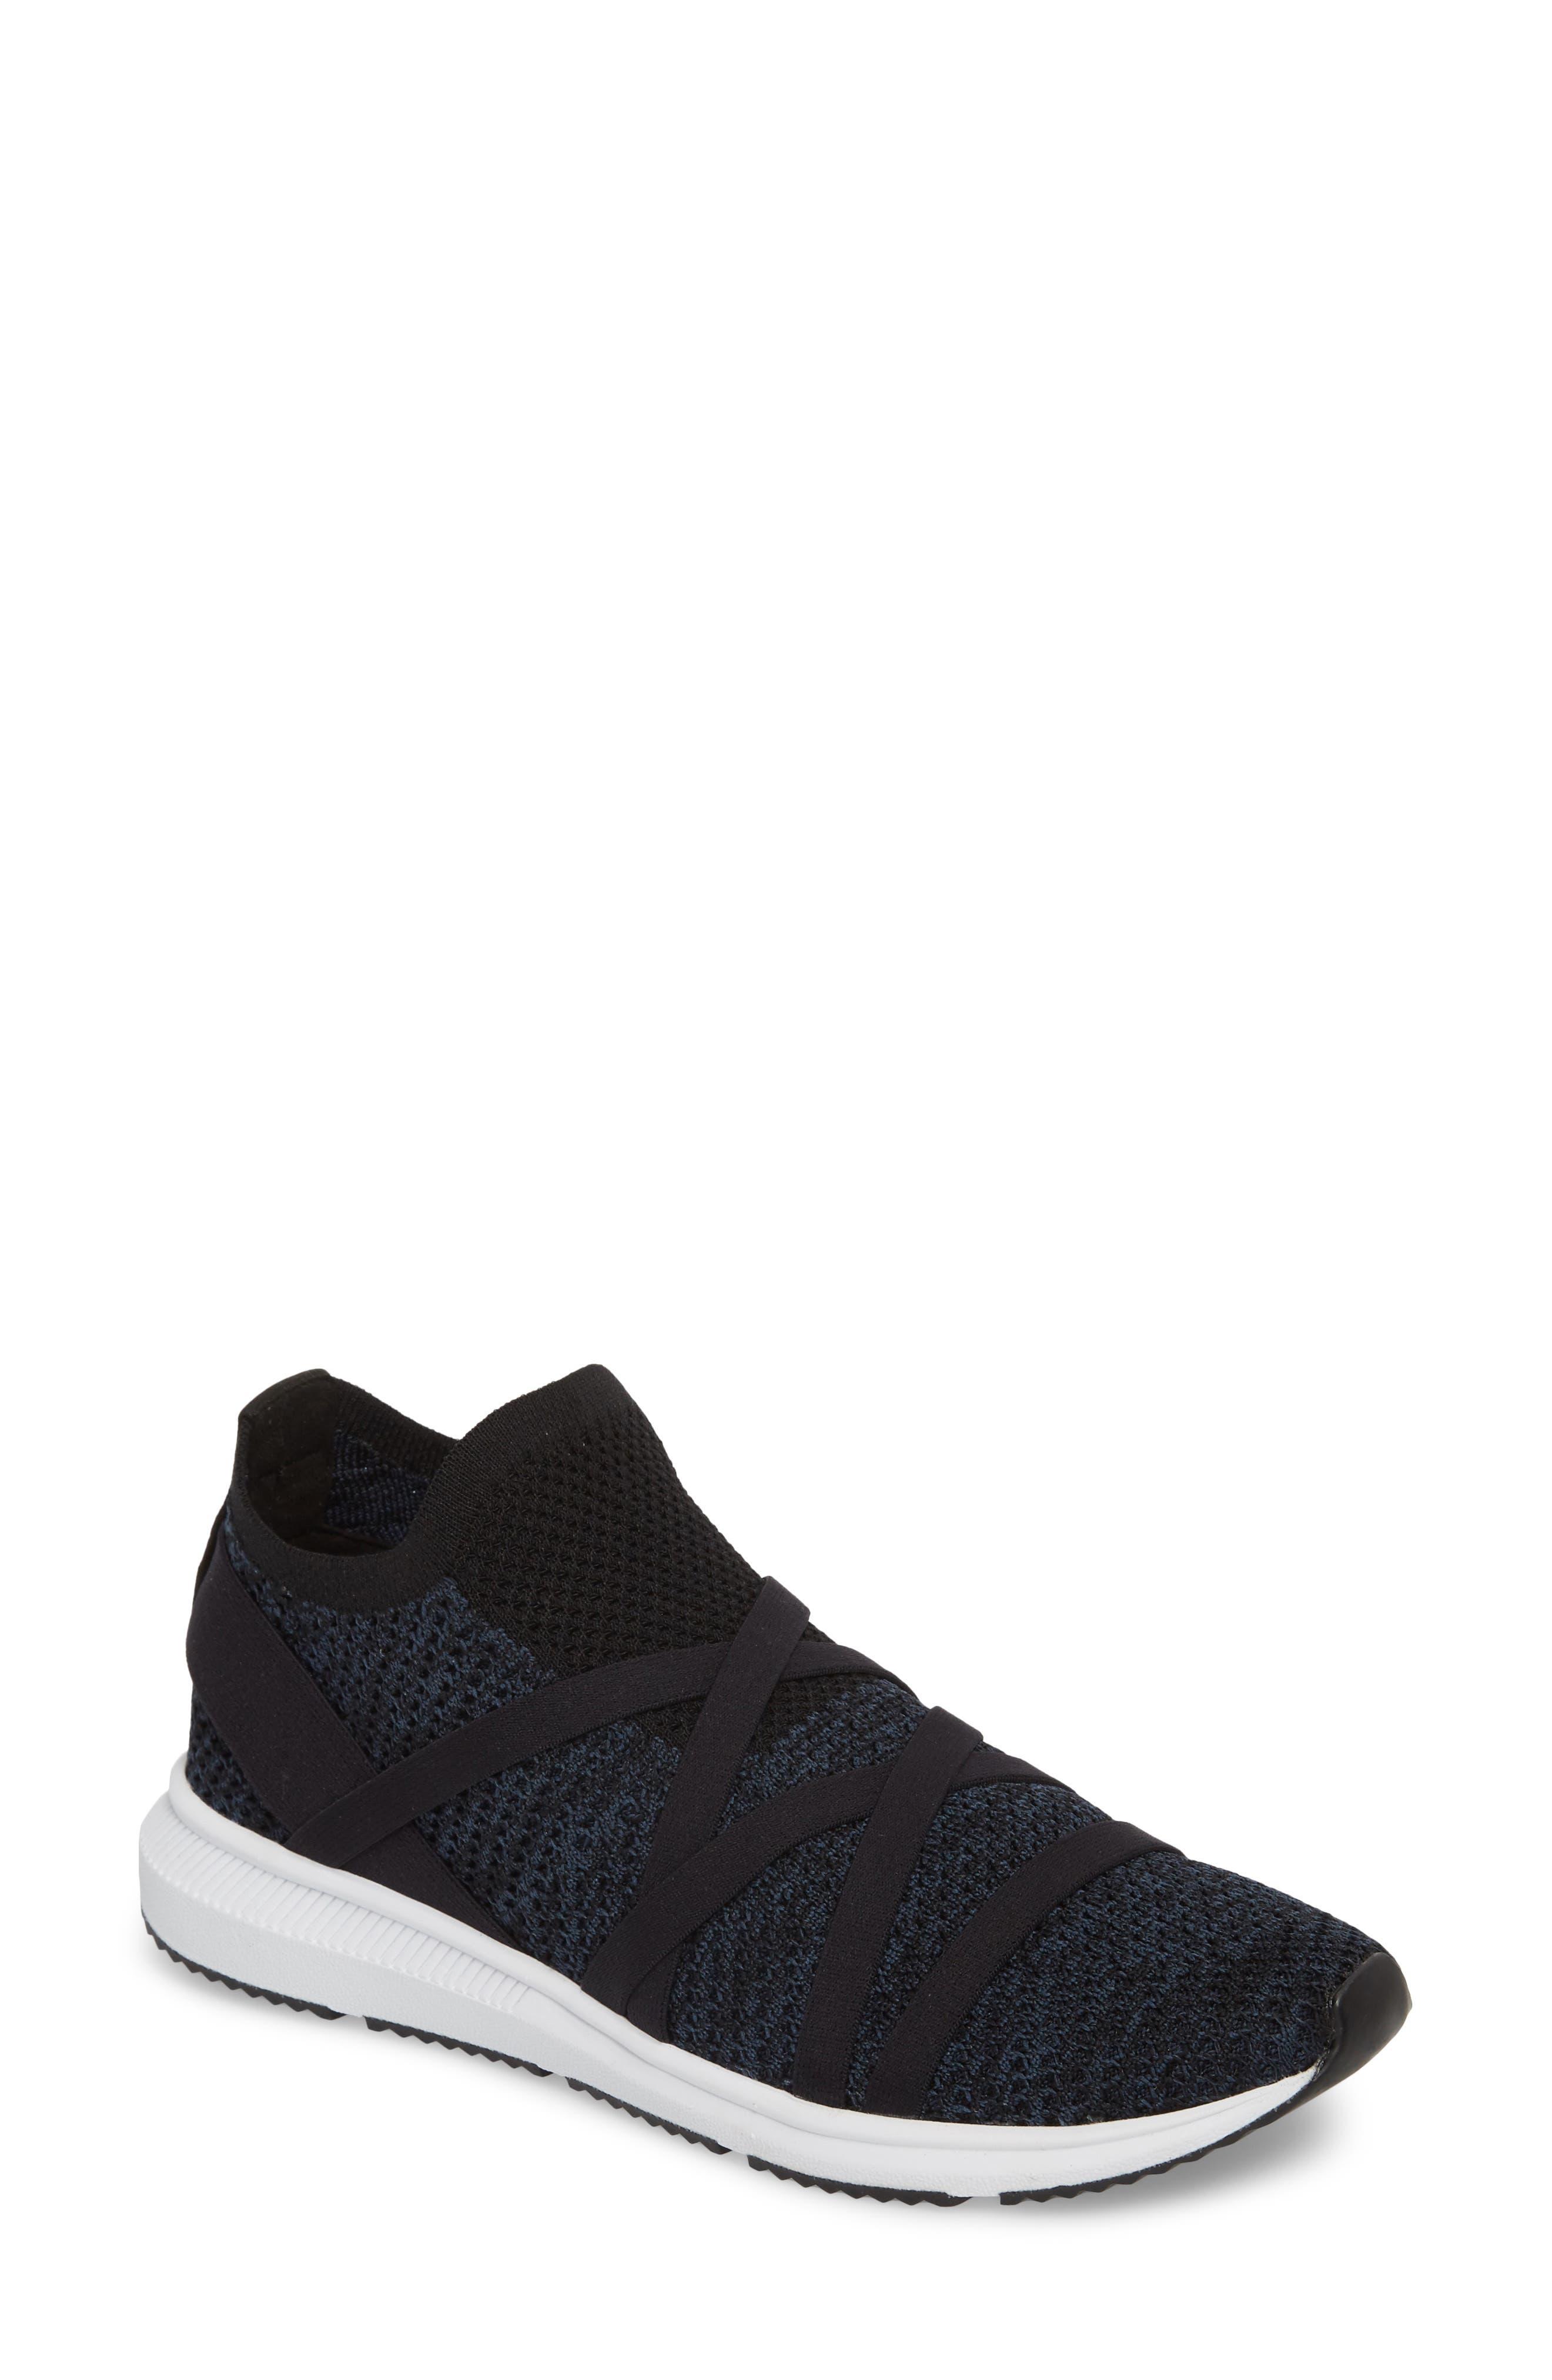 Xanady Woven Slip-On Sneaker,                         Main,                         color, BLACK/ MARINE STRETCH